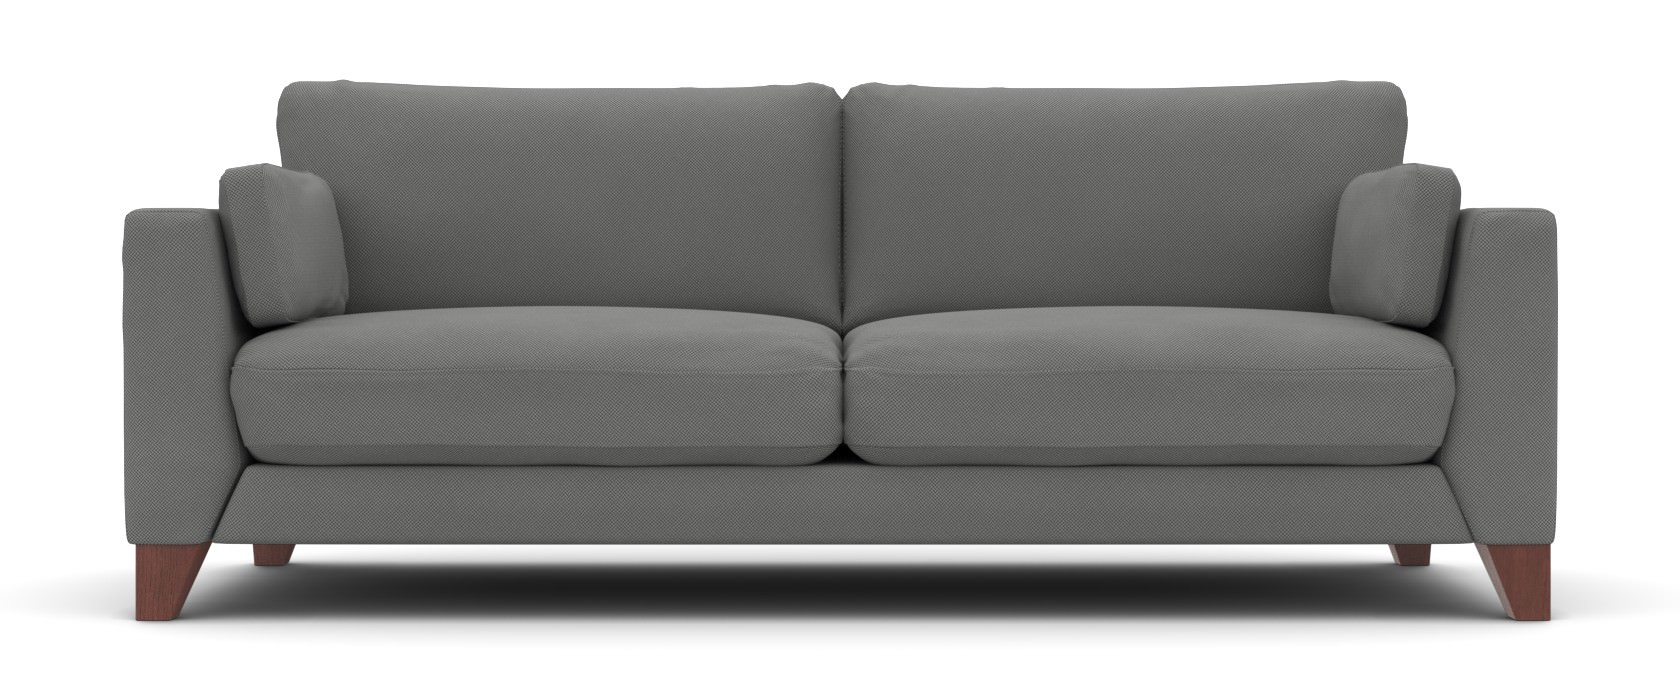 Тримісний диван Paolo - Pufetto